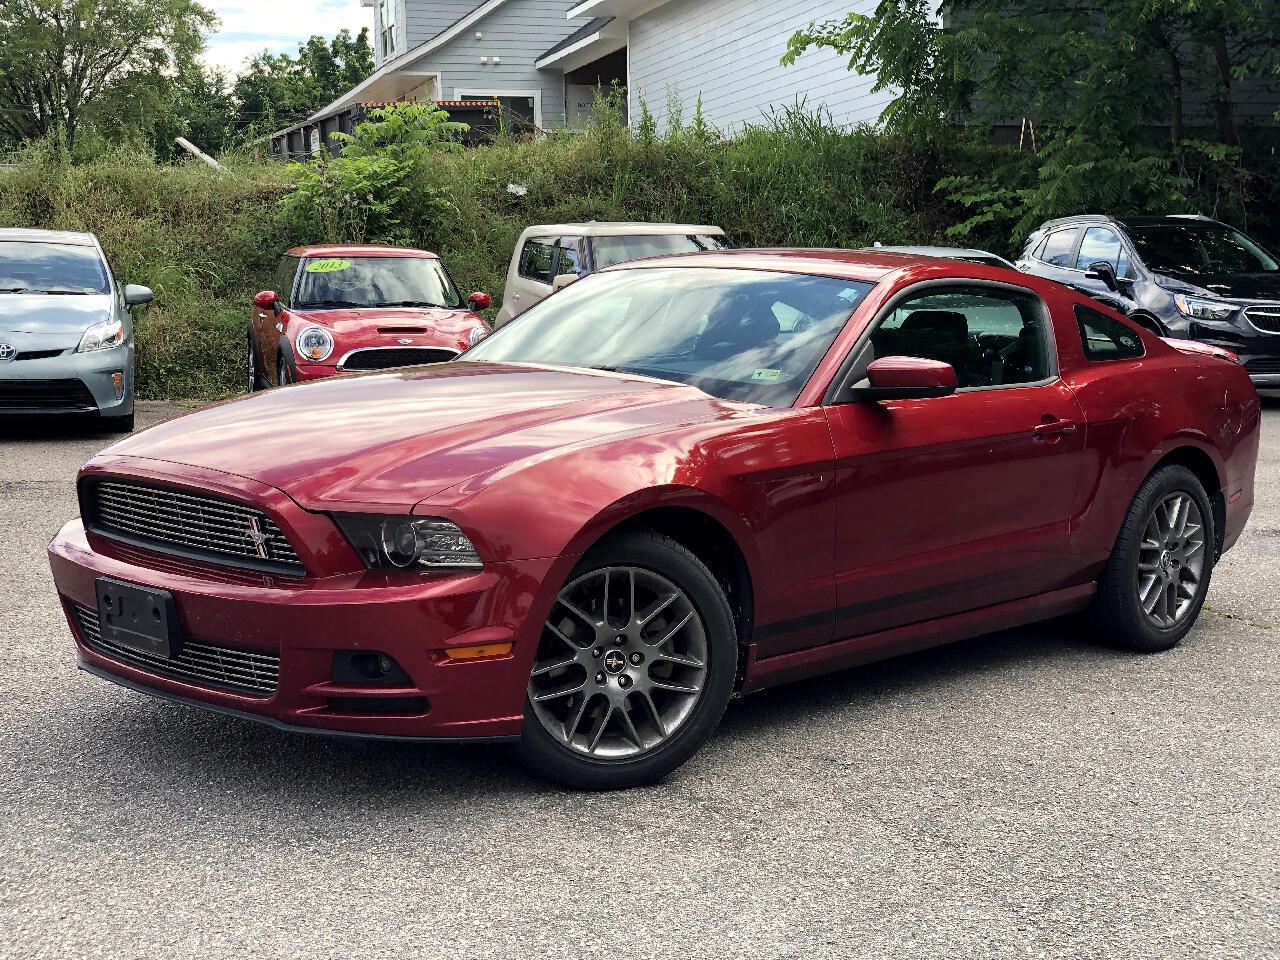 Ford Mustang 2dr Cpe V6 Premium 2014